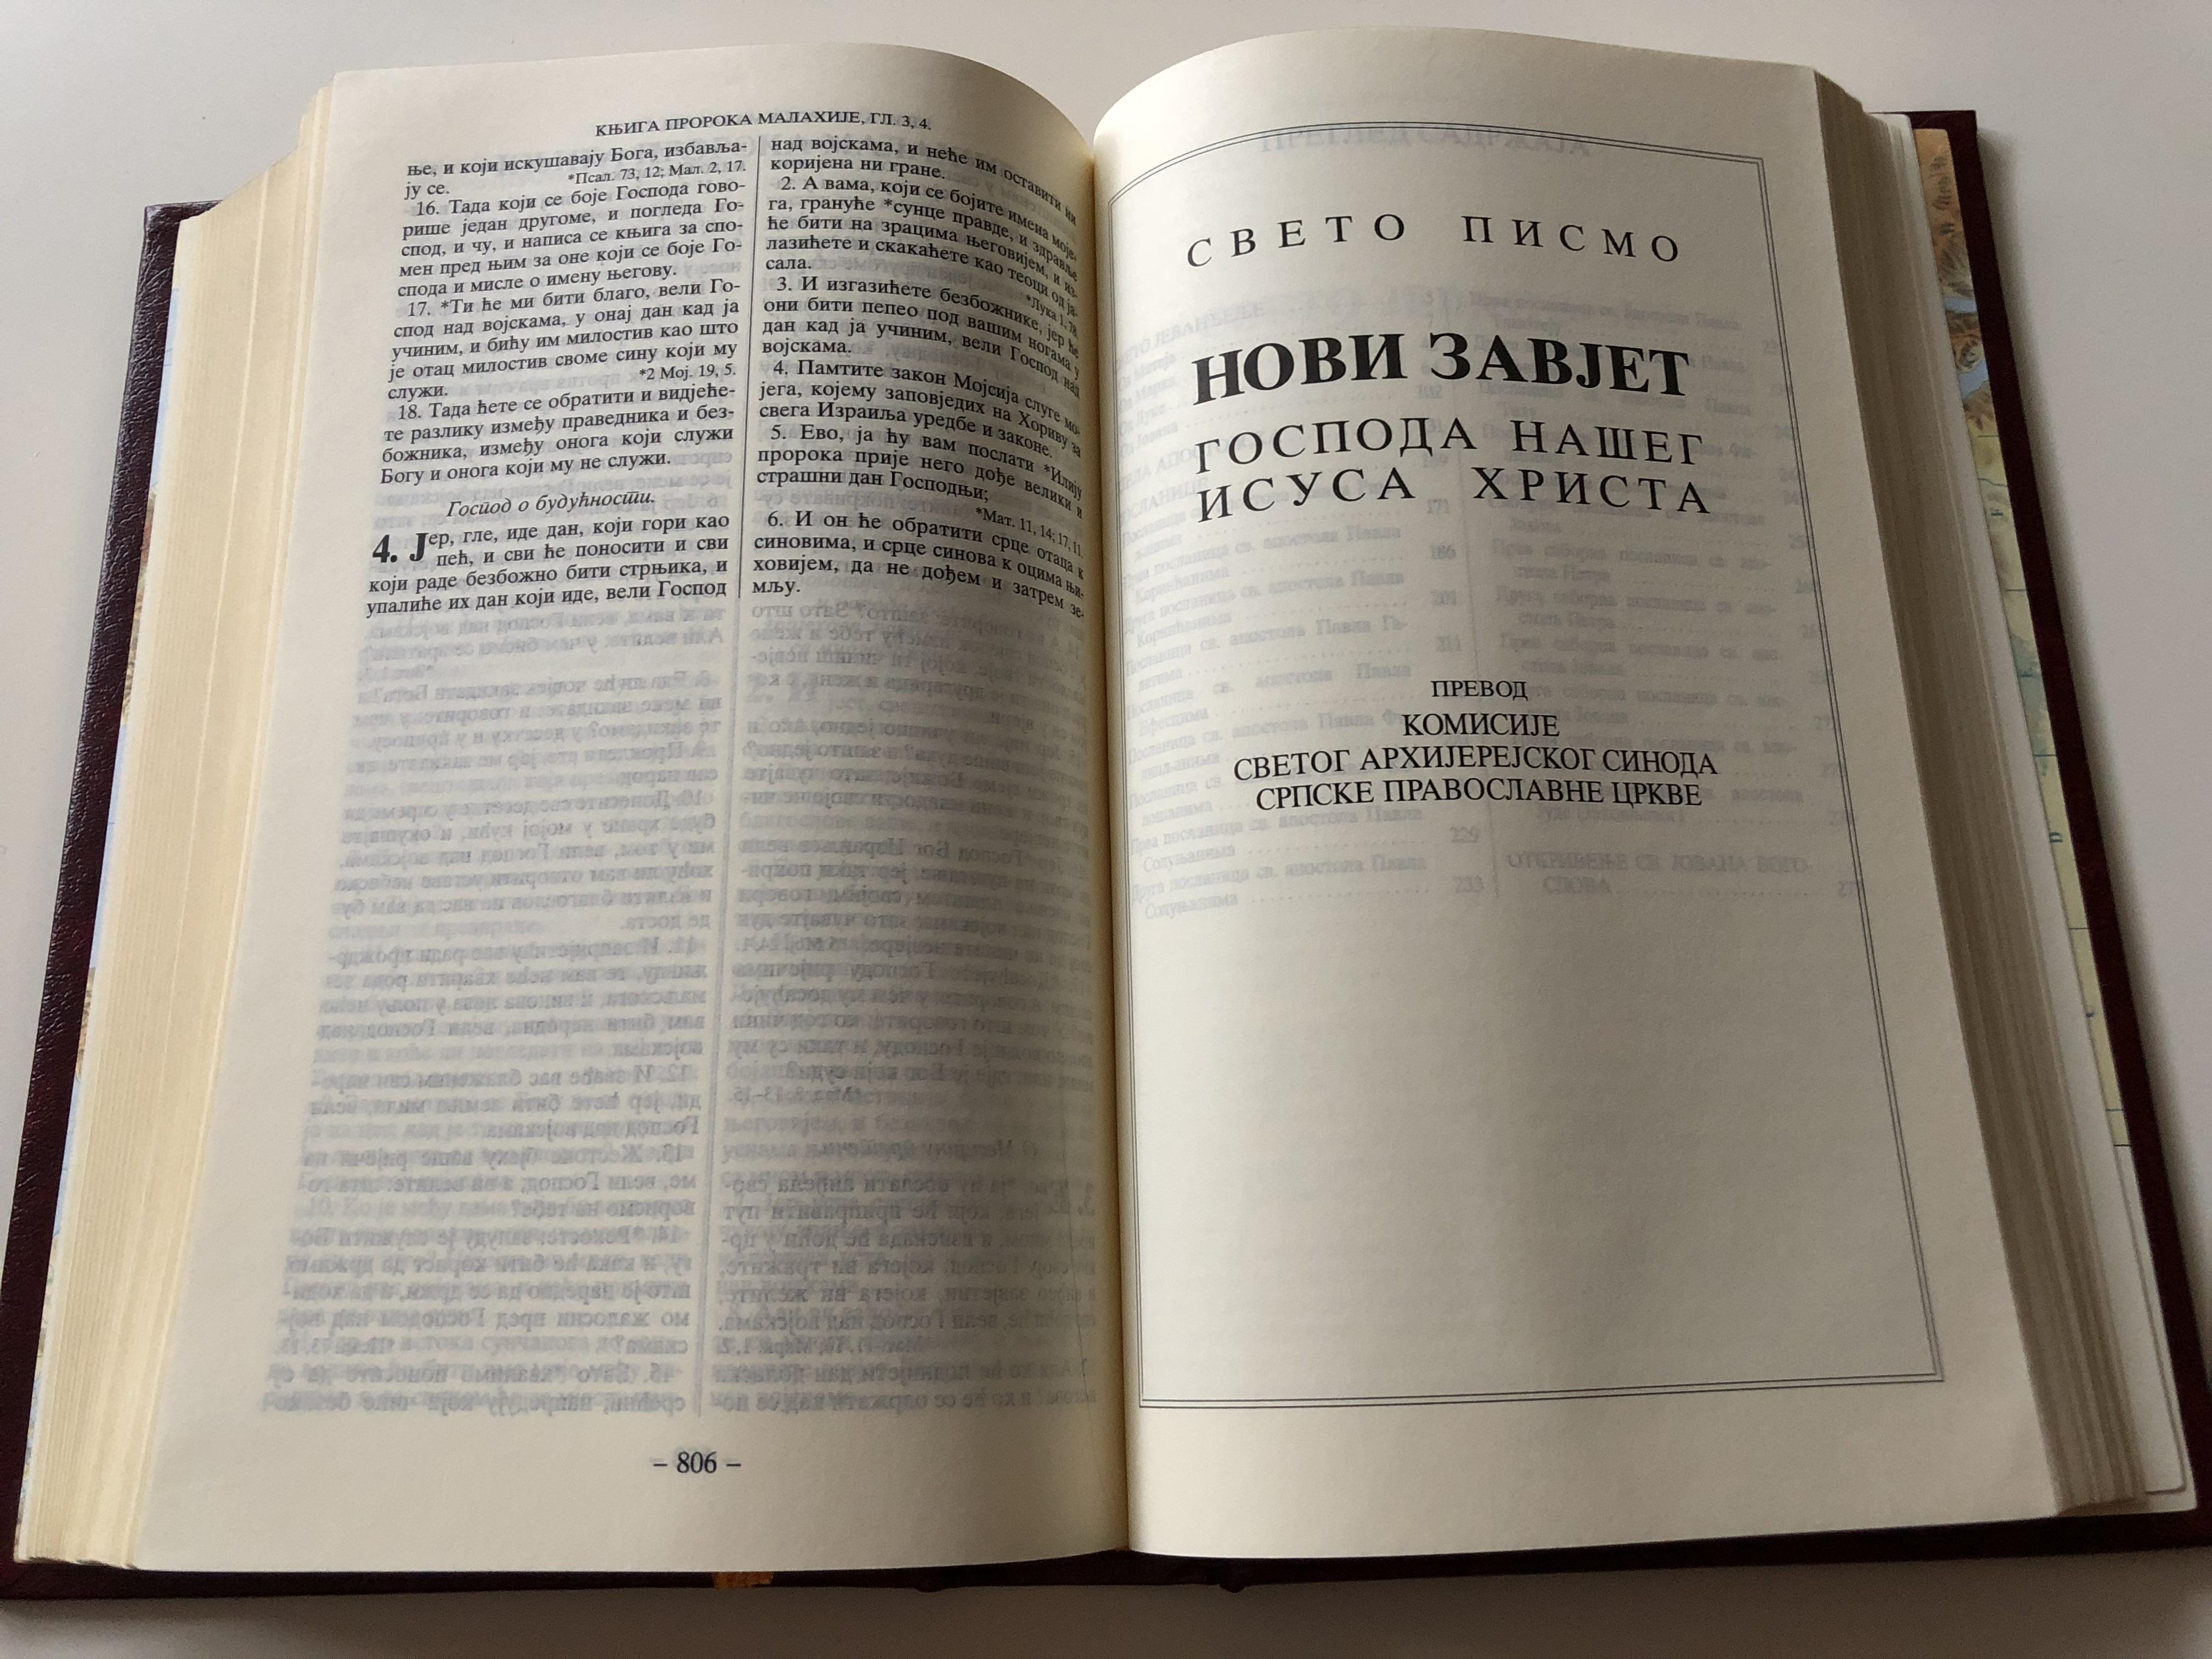 serbian-language-bible-burgundy-cover-with-golden-cross-cyrillic-script-043hs-15-.jpg